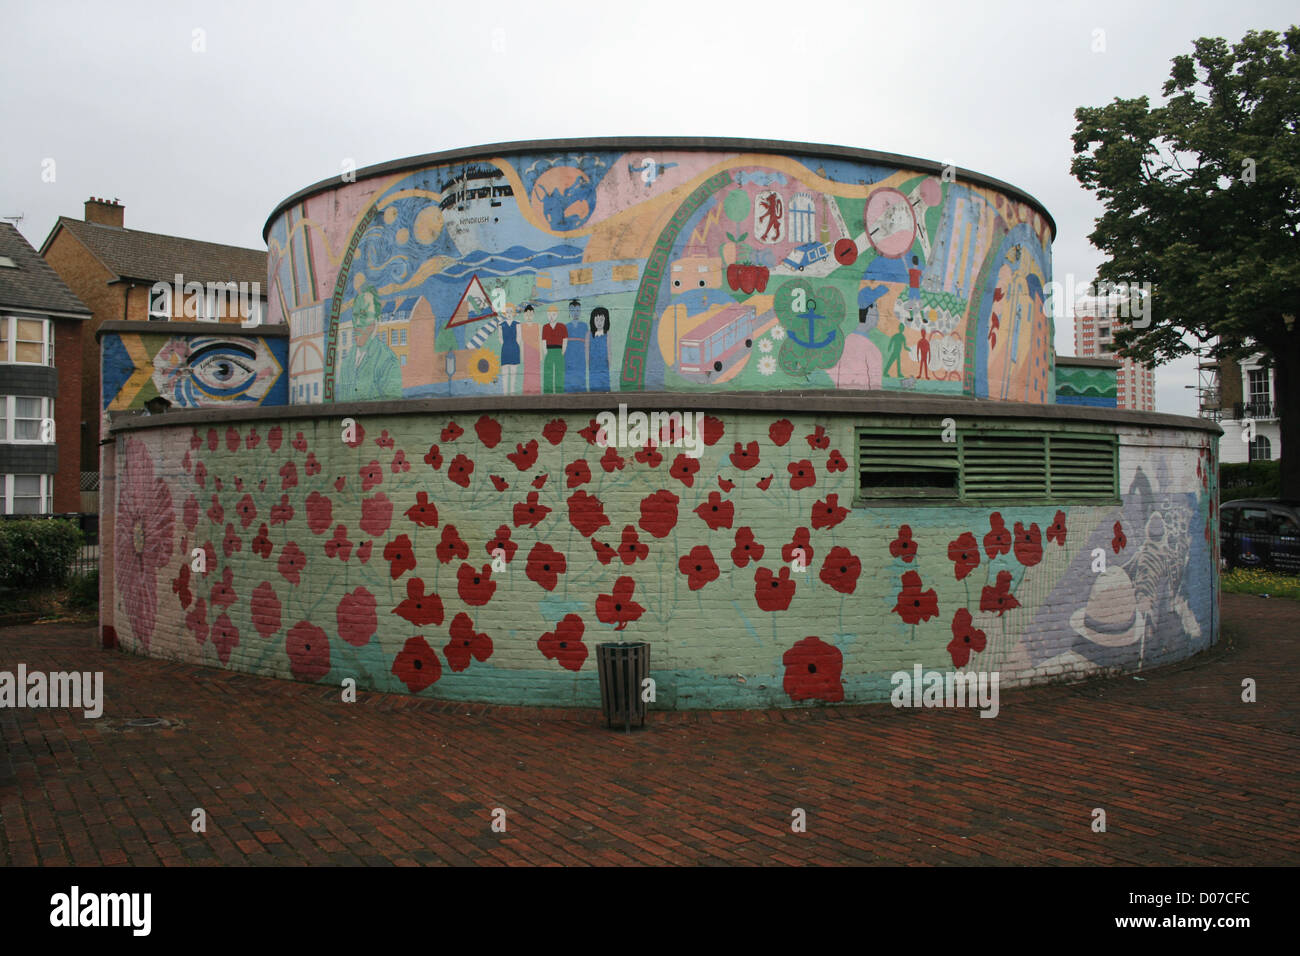 Stockwell Mural - Stock Image